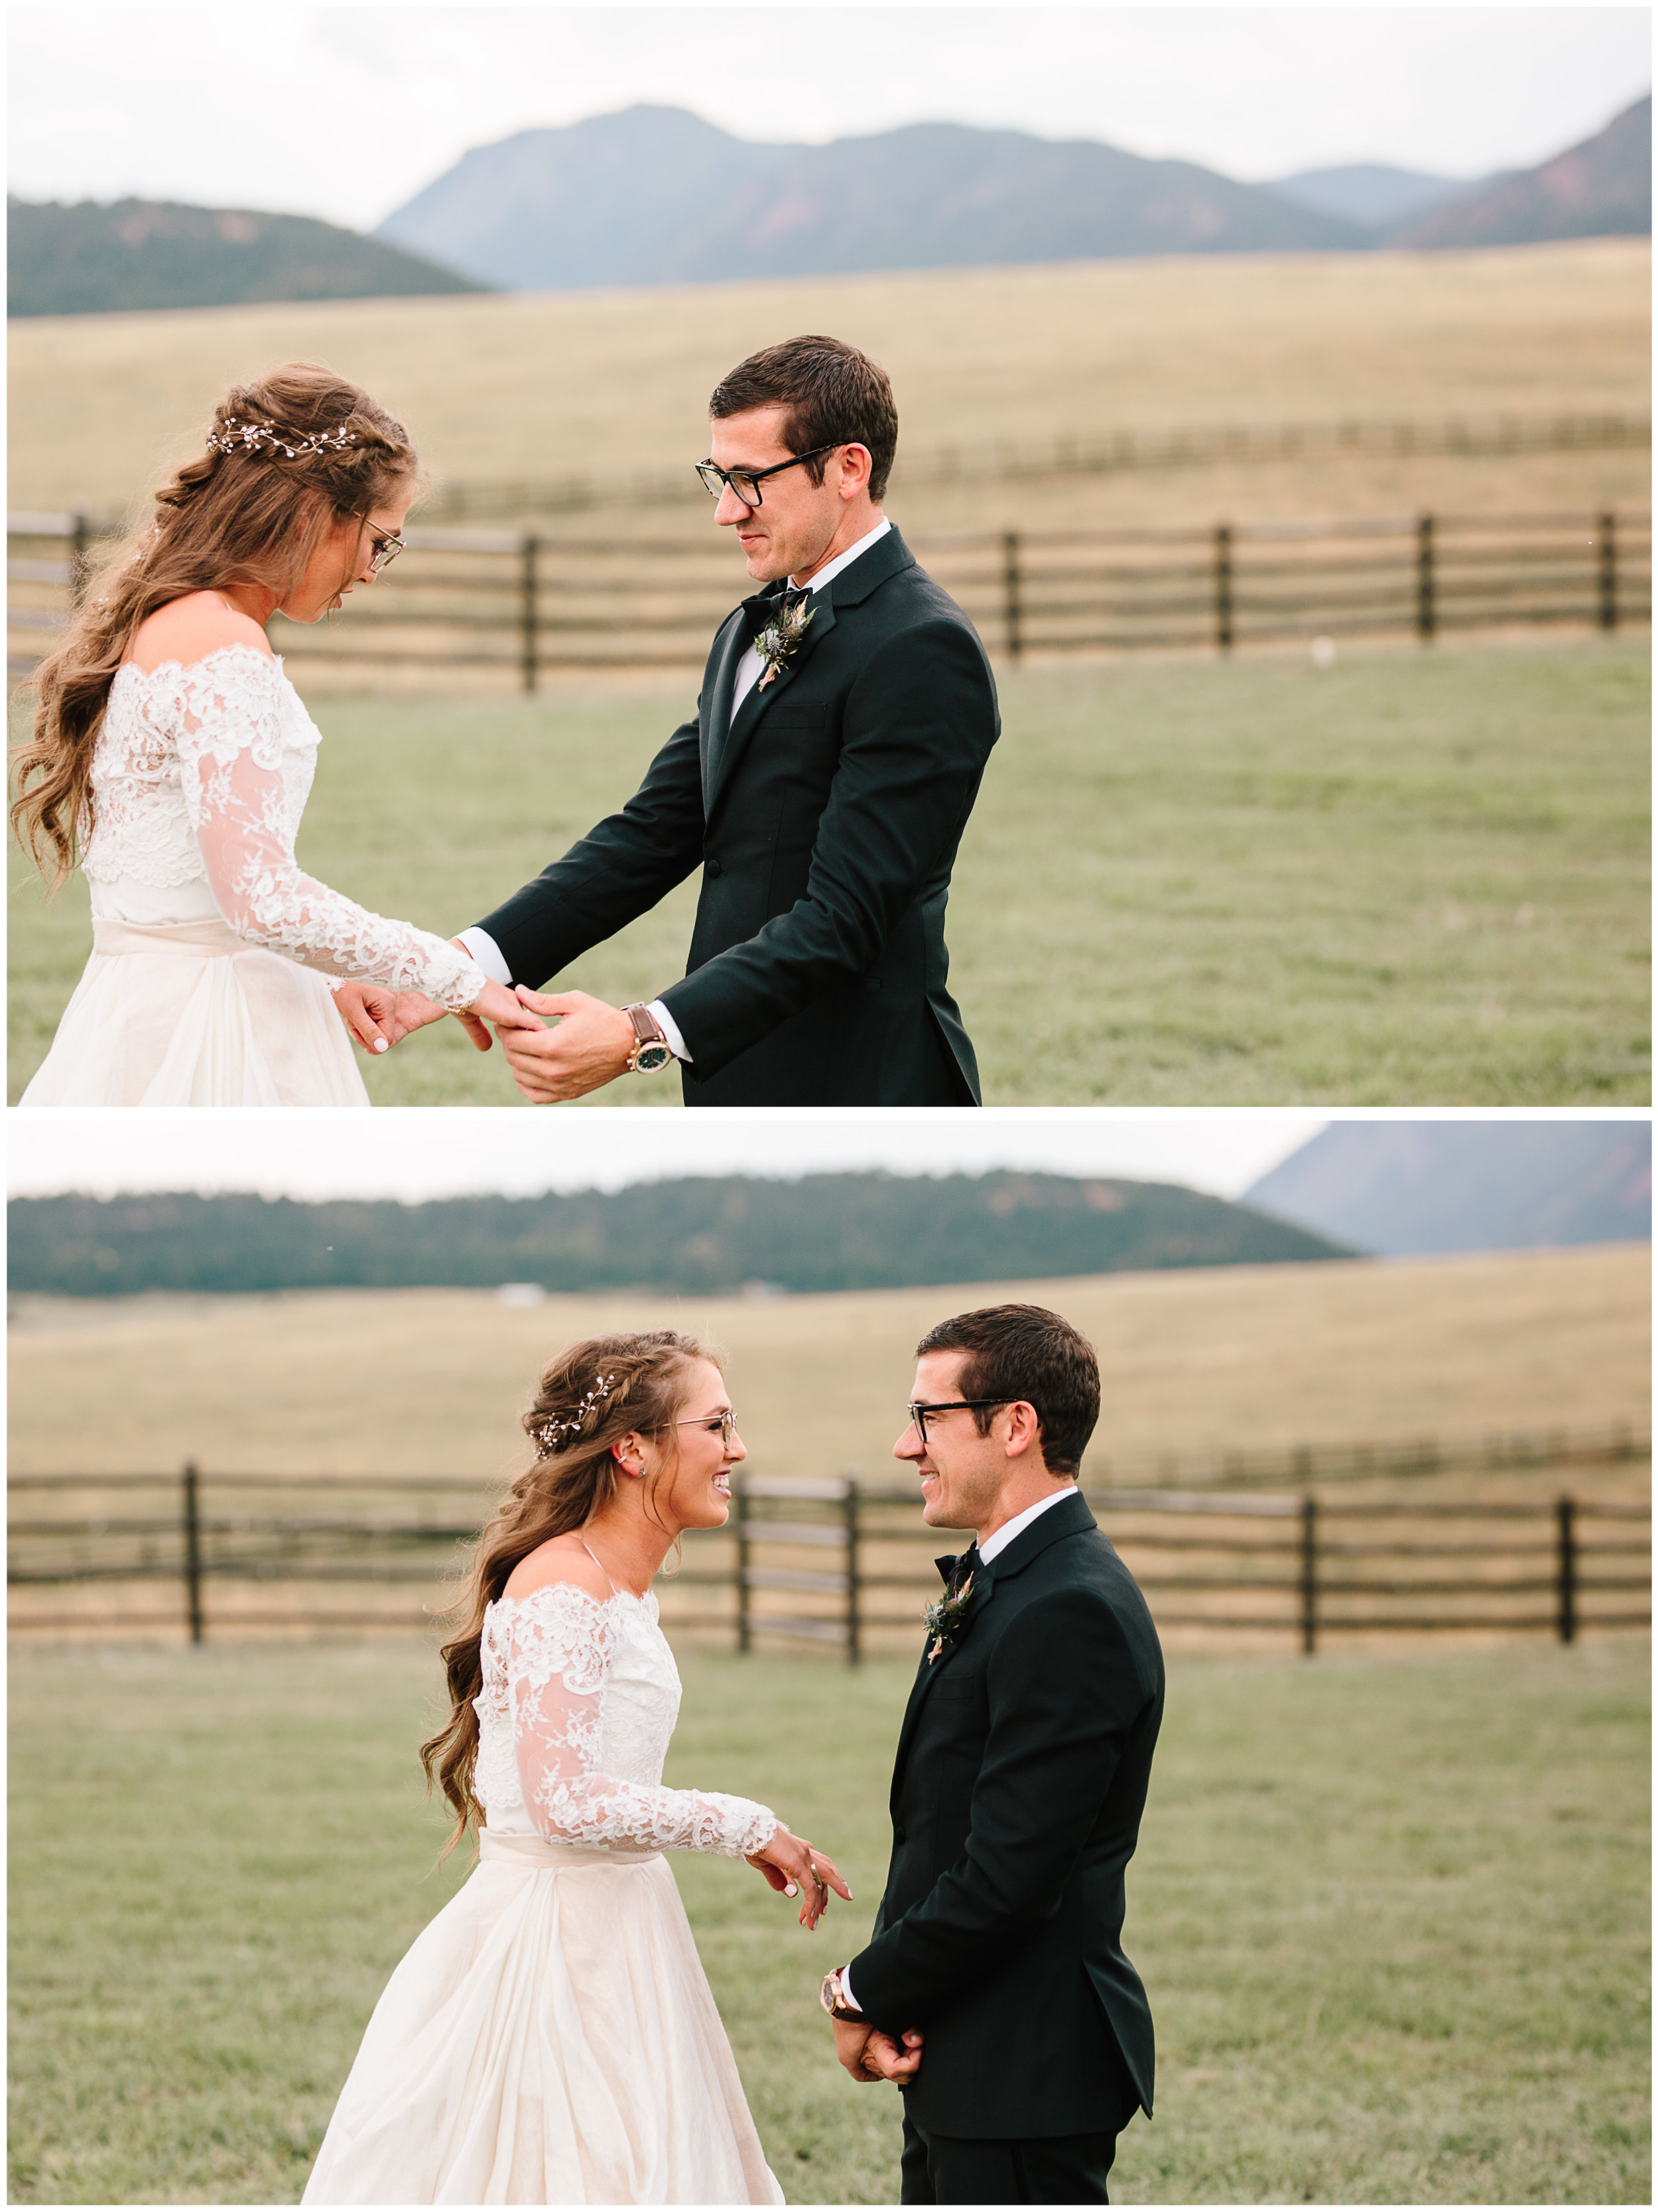 spruce_mountain_ranch_wedding_23.jpg